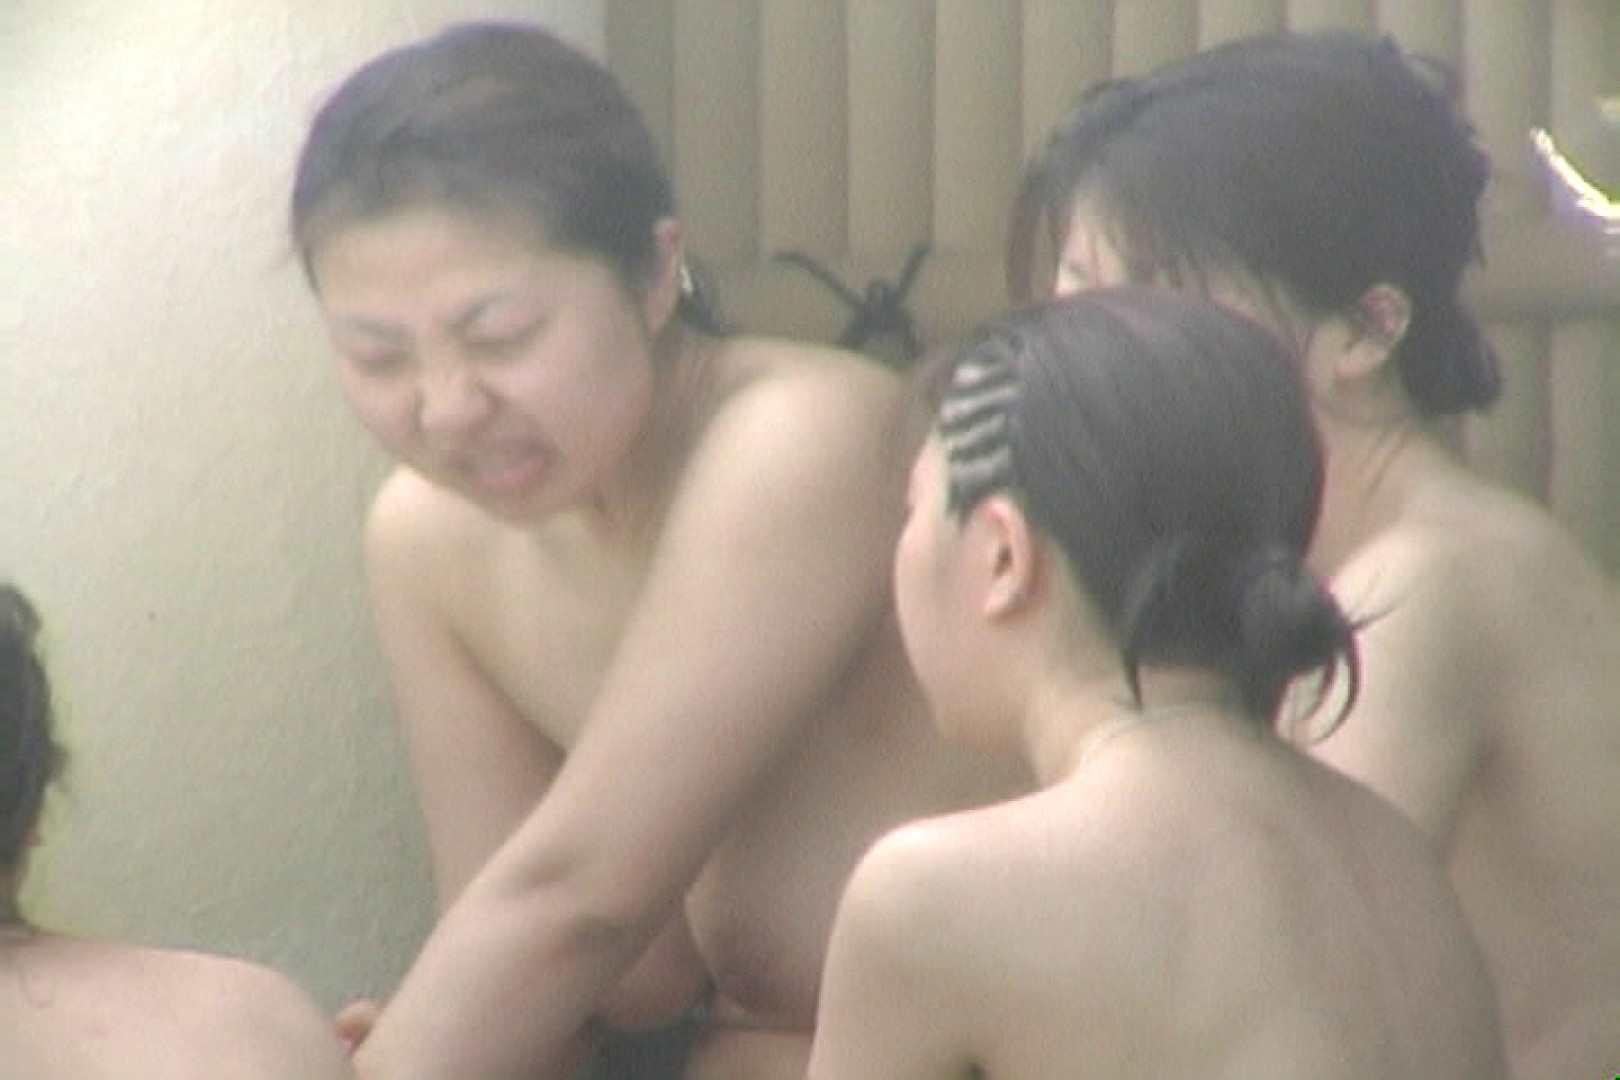 Aquaな露天風呂Vol.31【VIP】 OLのプライベート  11pic 3